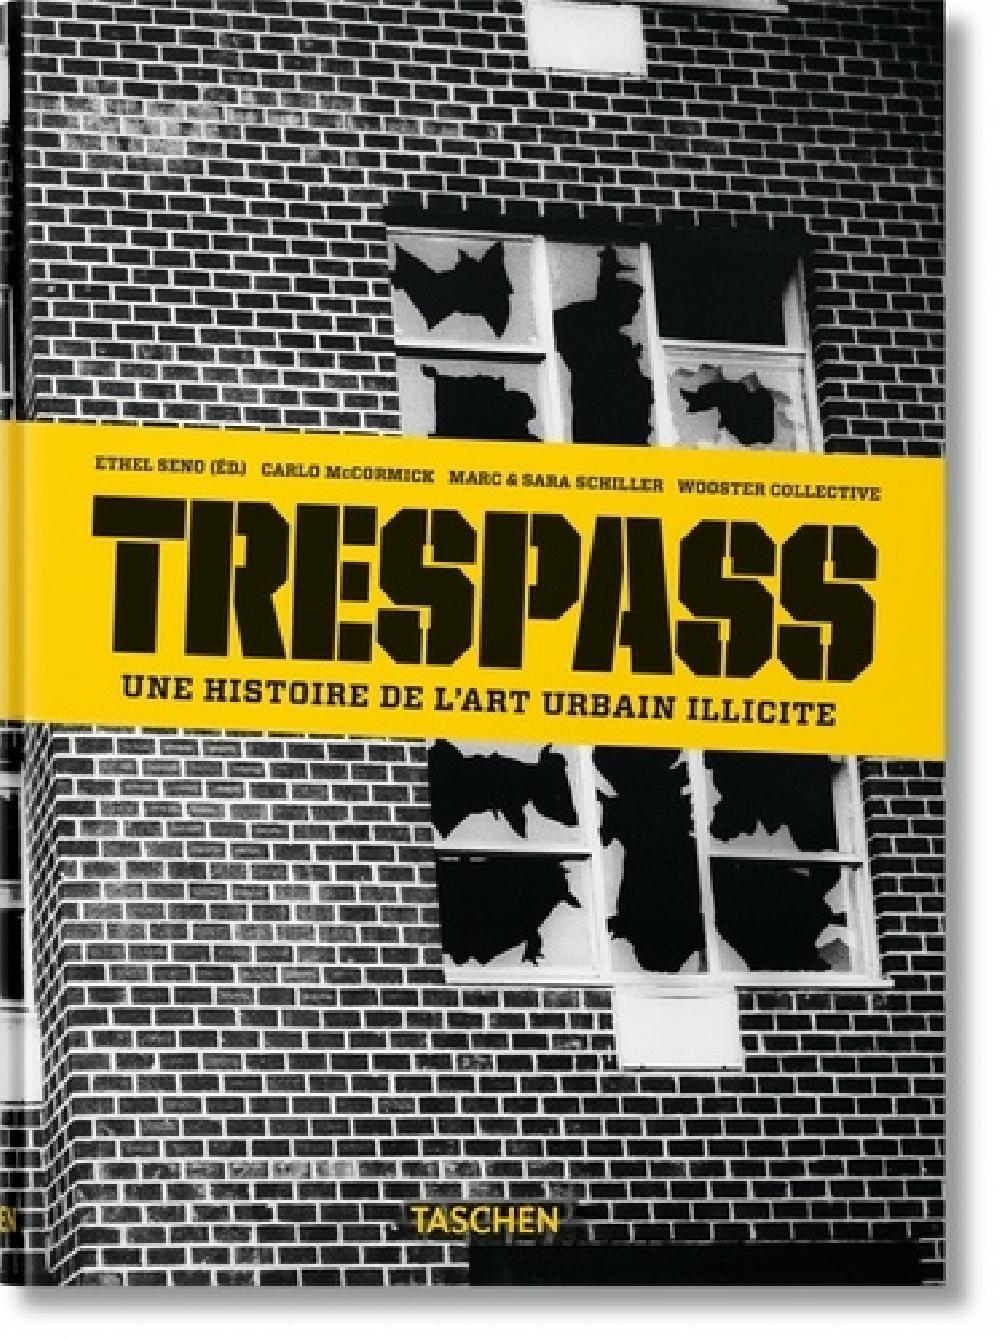 Trespass - Une histoire de l'art urbain illicite